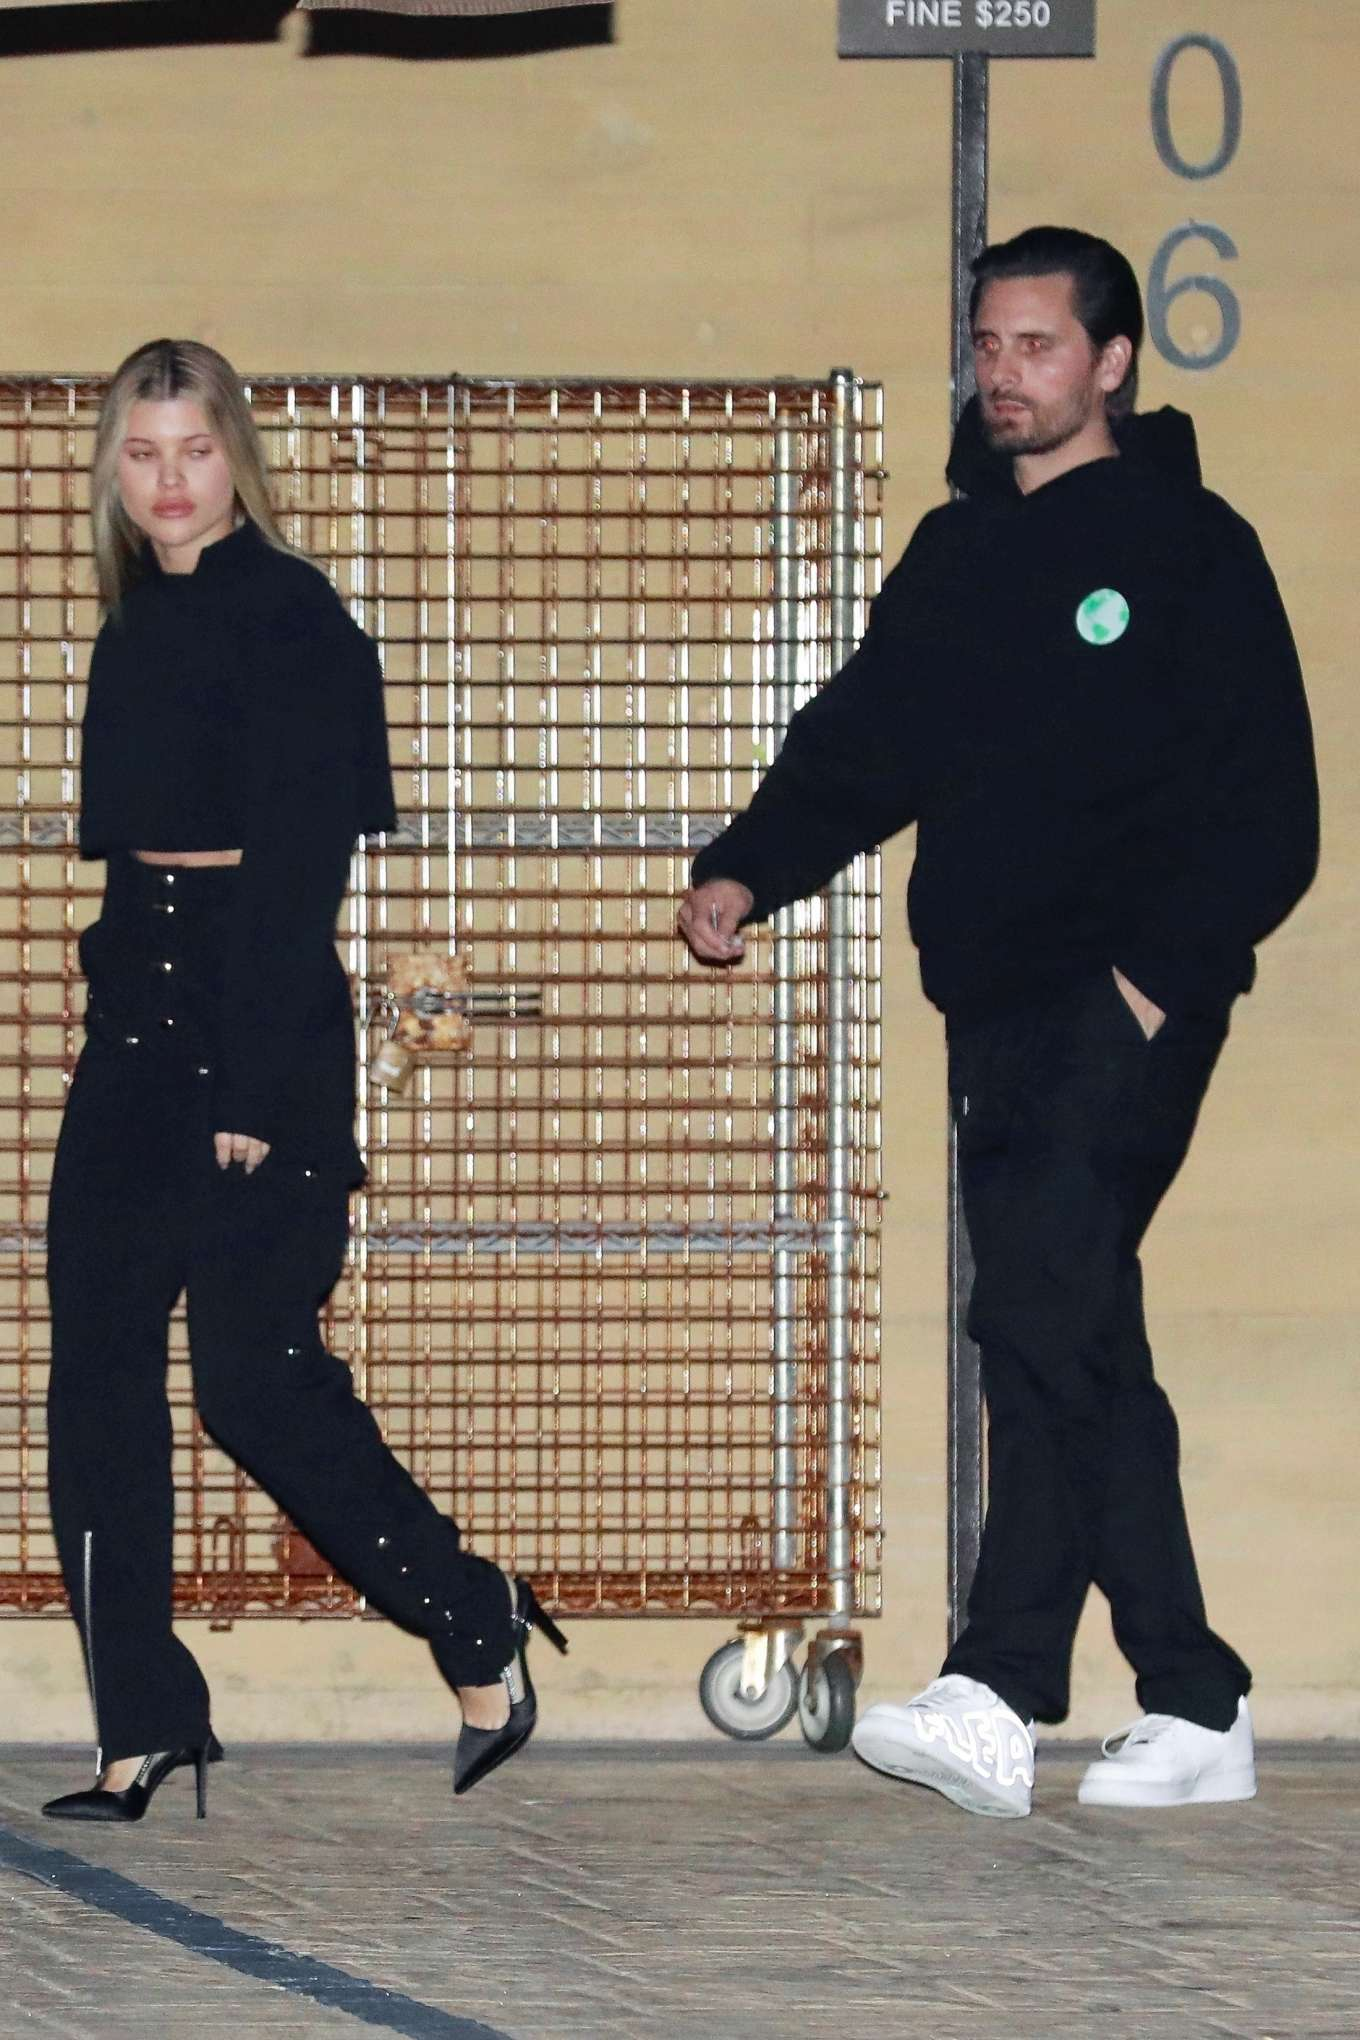 Sofia Richie and her boyfriend Scott Disick - Leaves the Nobu restaurant in Malibu